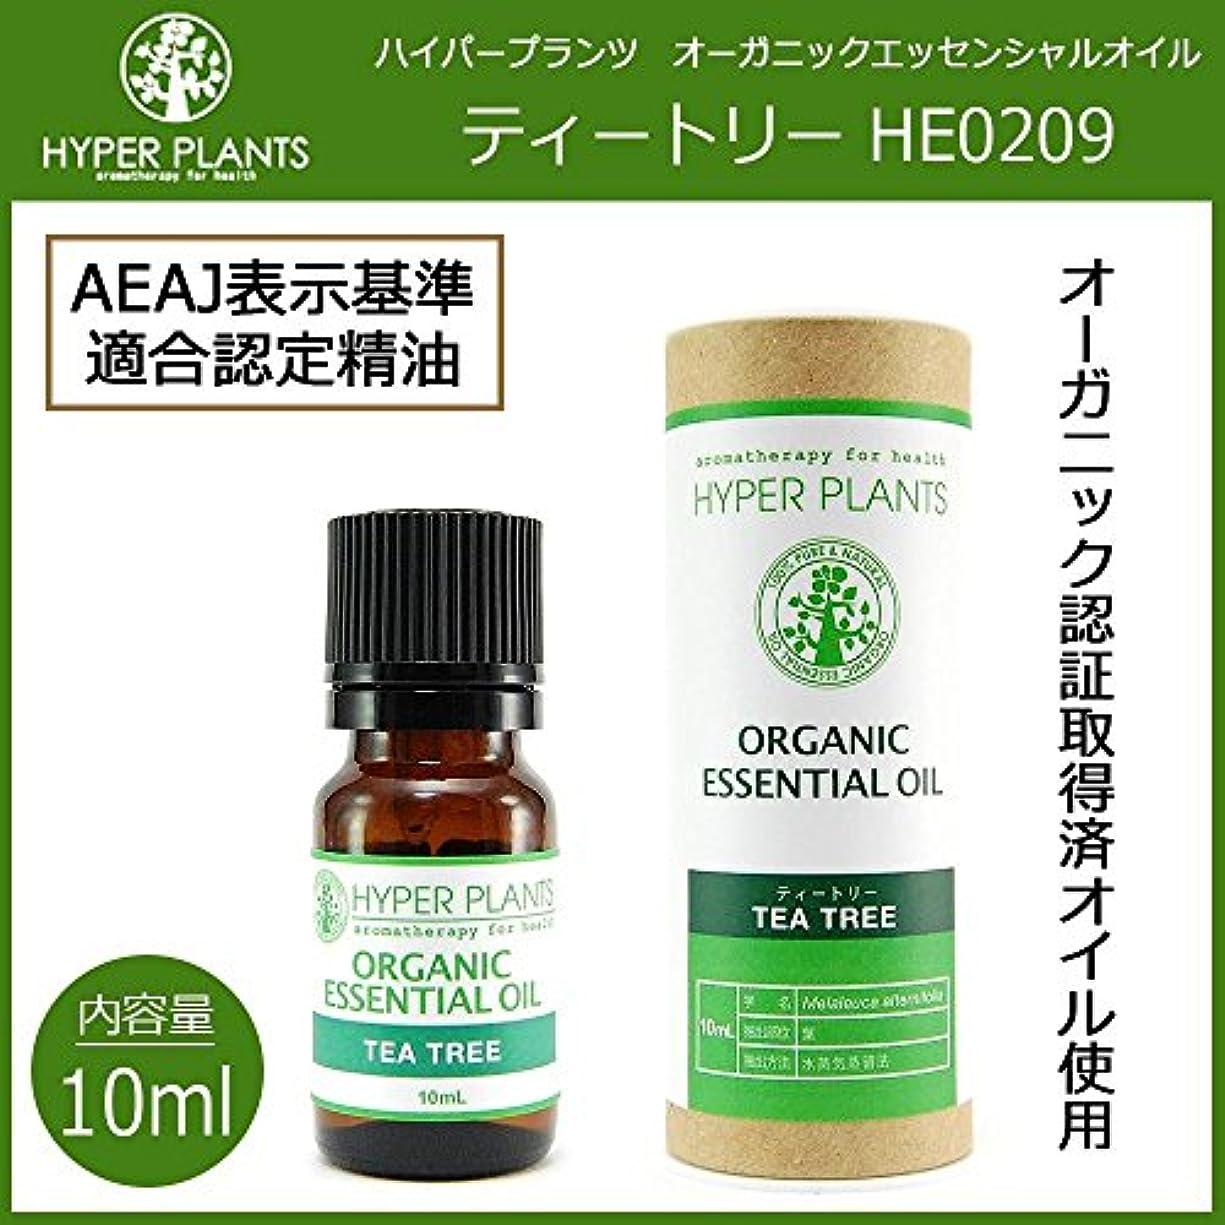 HYPER PLANTS ハイパープランツ オーガニックエッセンシャルオイル ティートリー 10ml HE0209